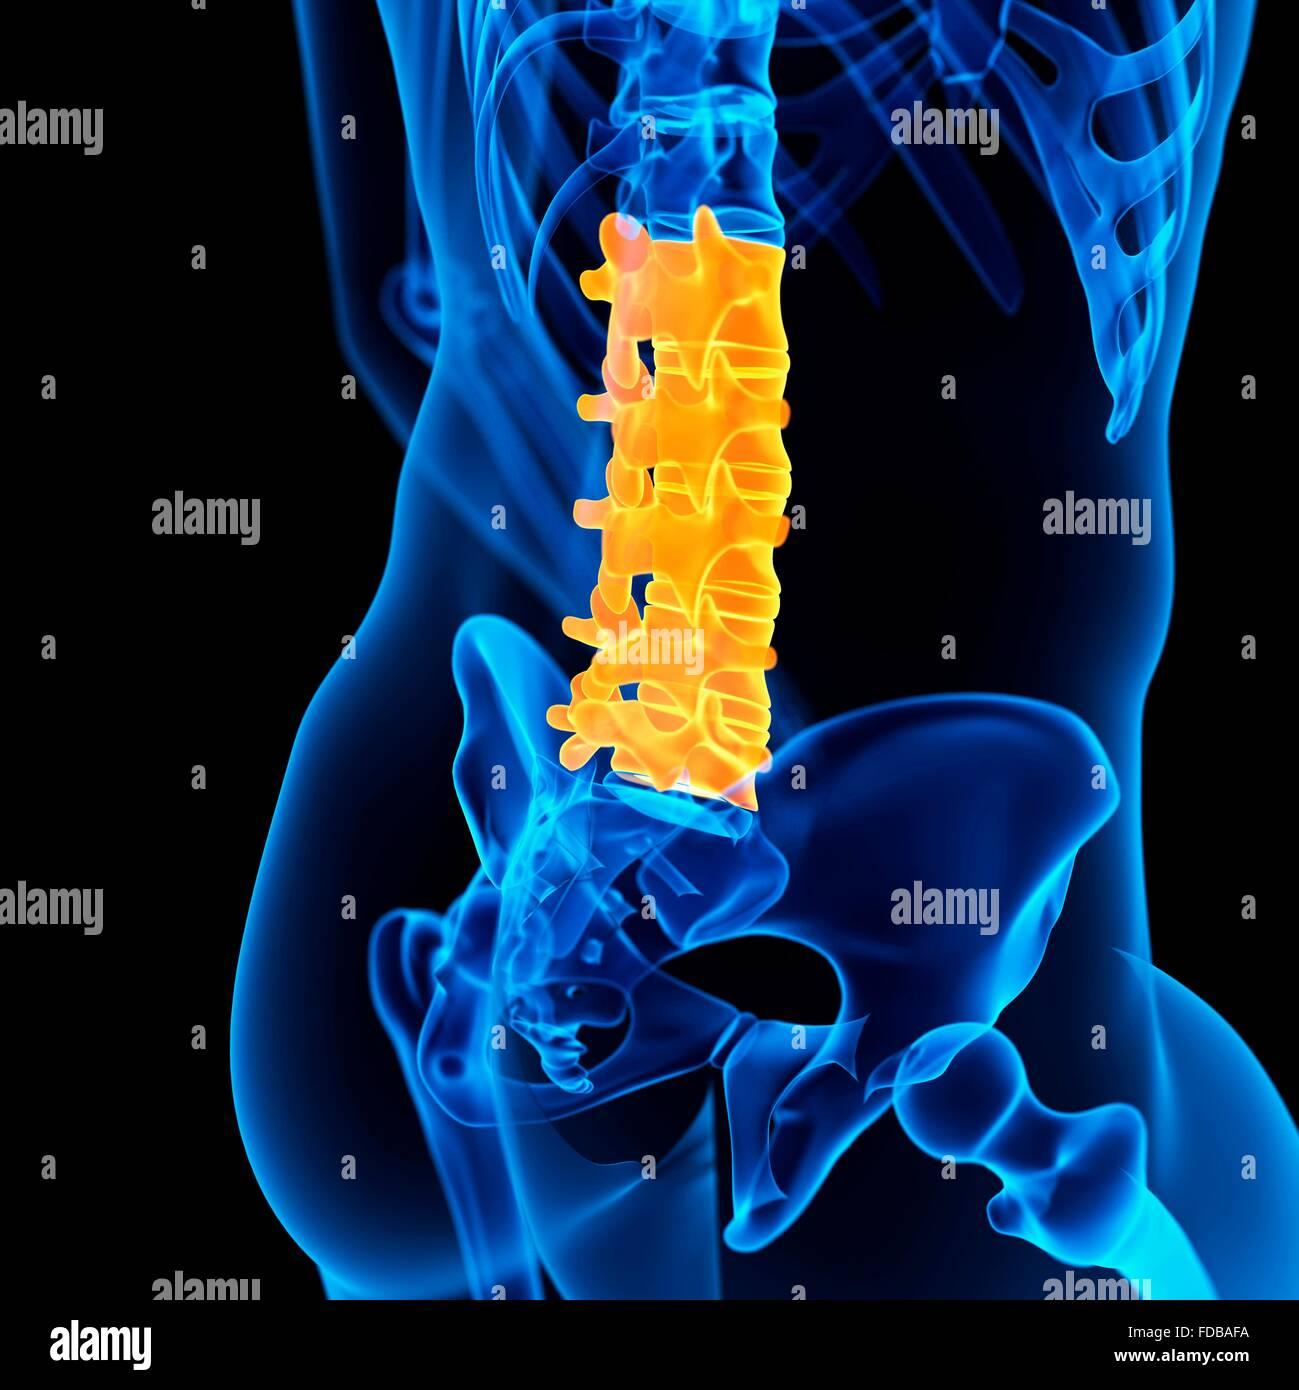 Human lumbar spine, illustration. - Stock Image